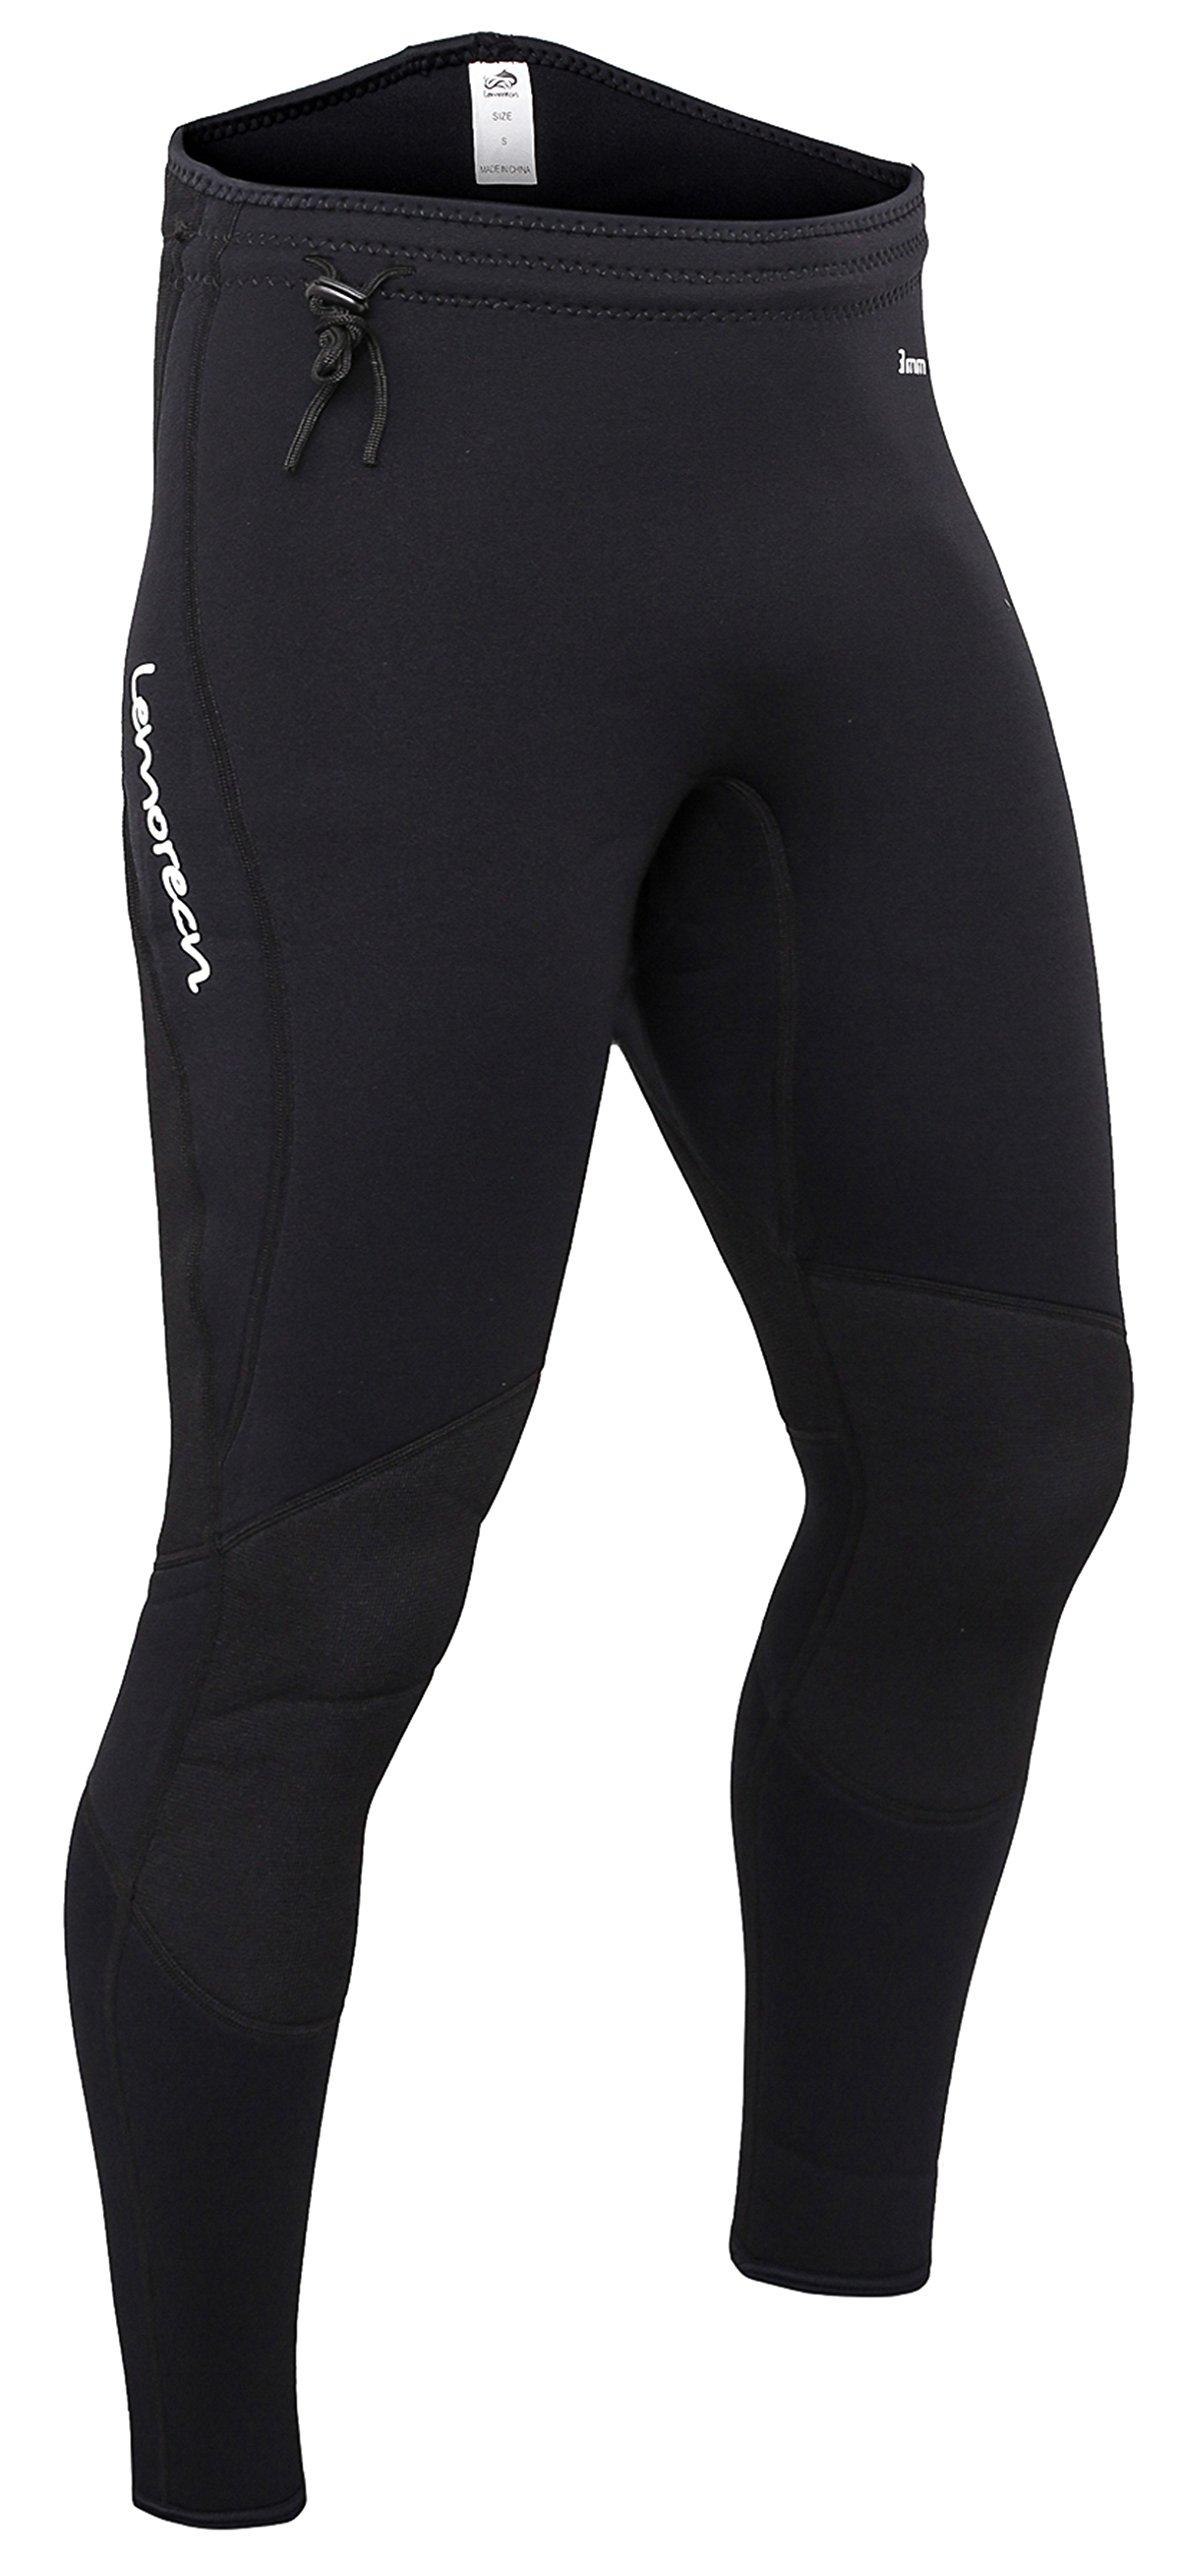 Lemorecn Wetsuits Pants 3mm Neoprene Winter Swimming Canoeing Pants(1031M) by Lemorecn